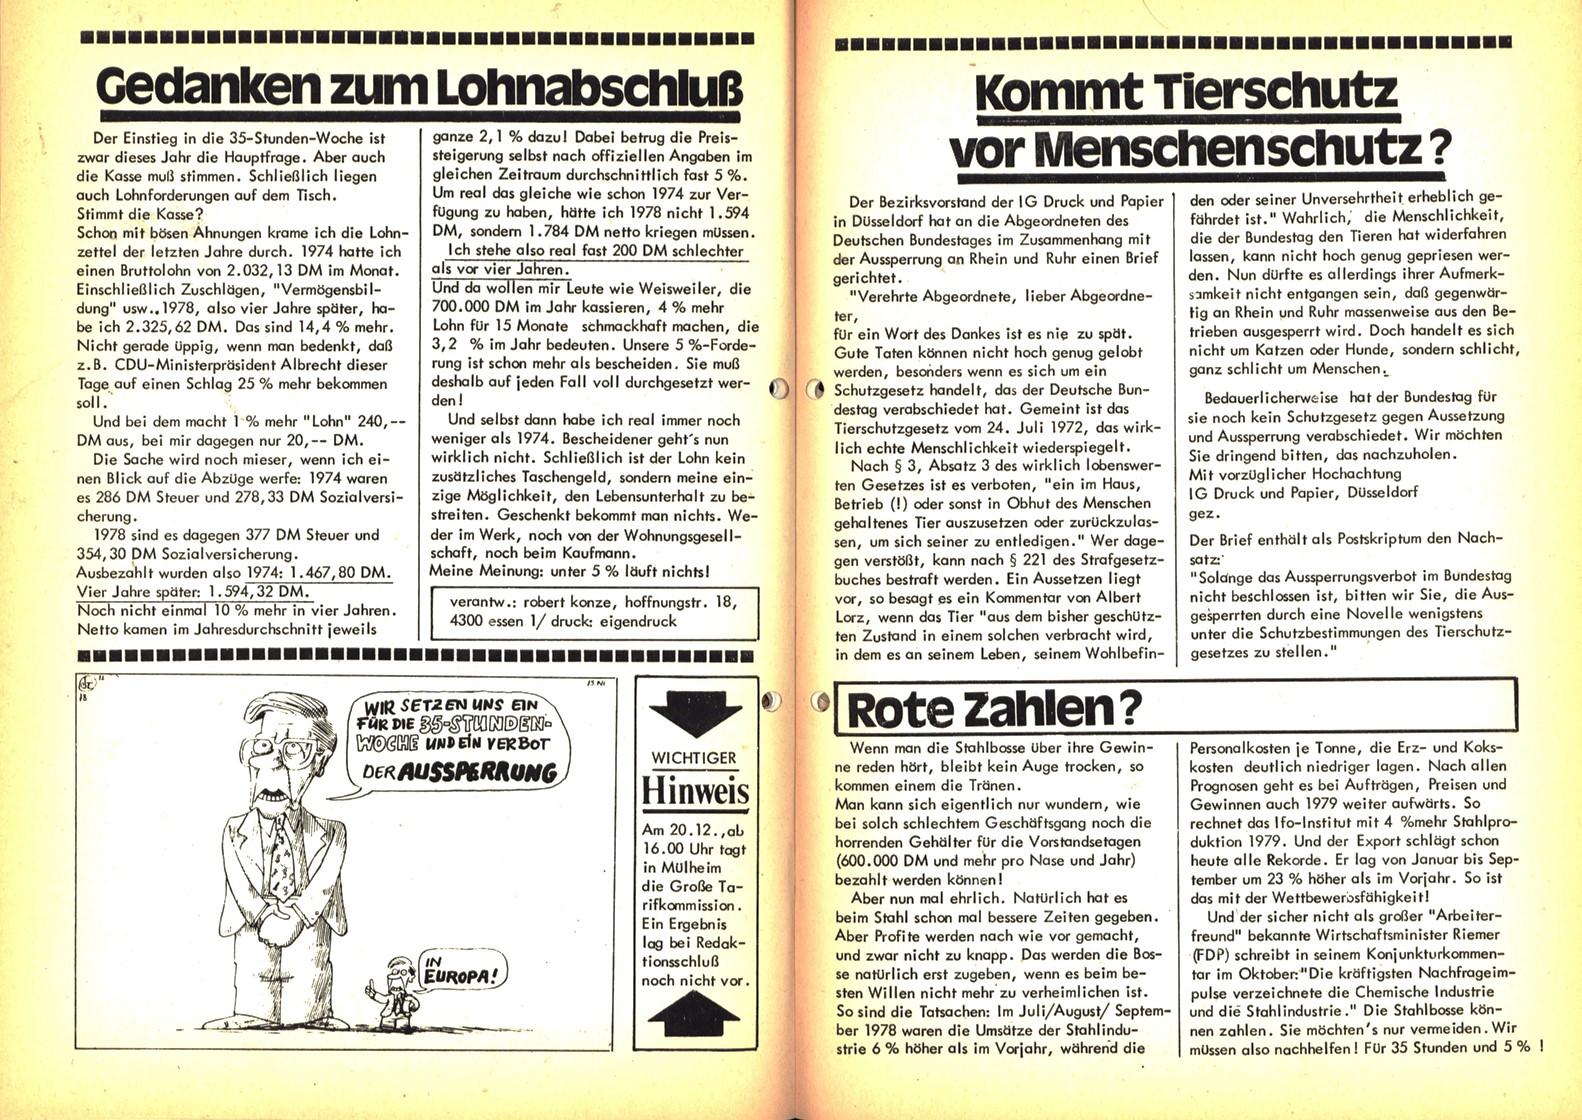 GE_DKP_Blechmacher_19781200_02_02